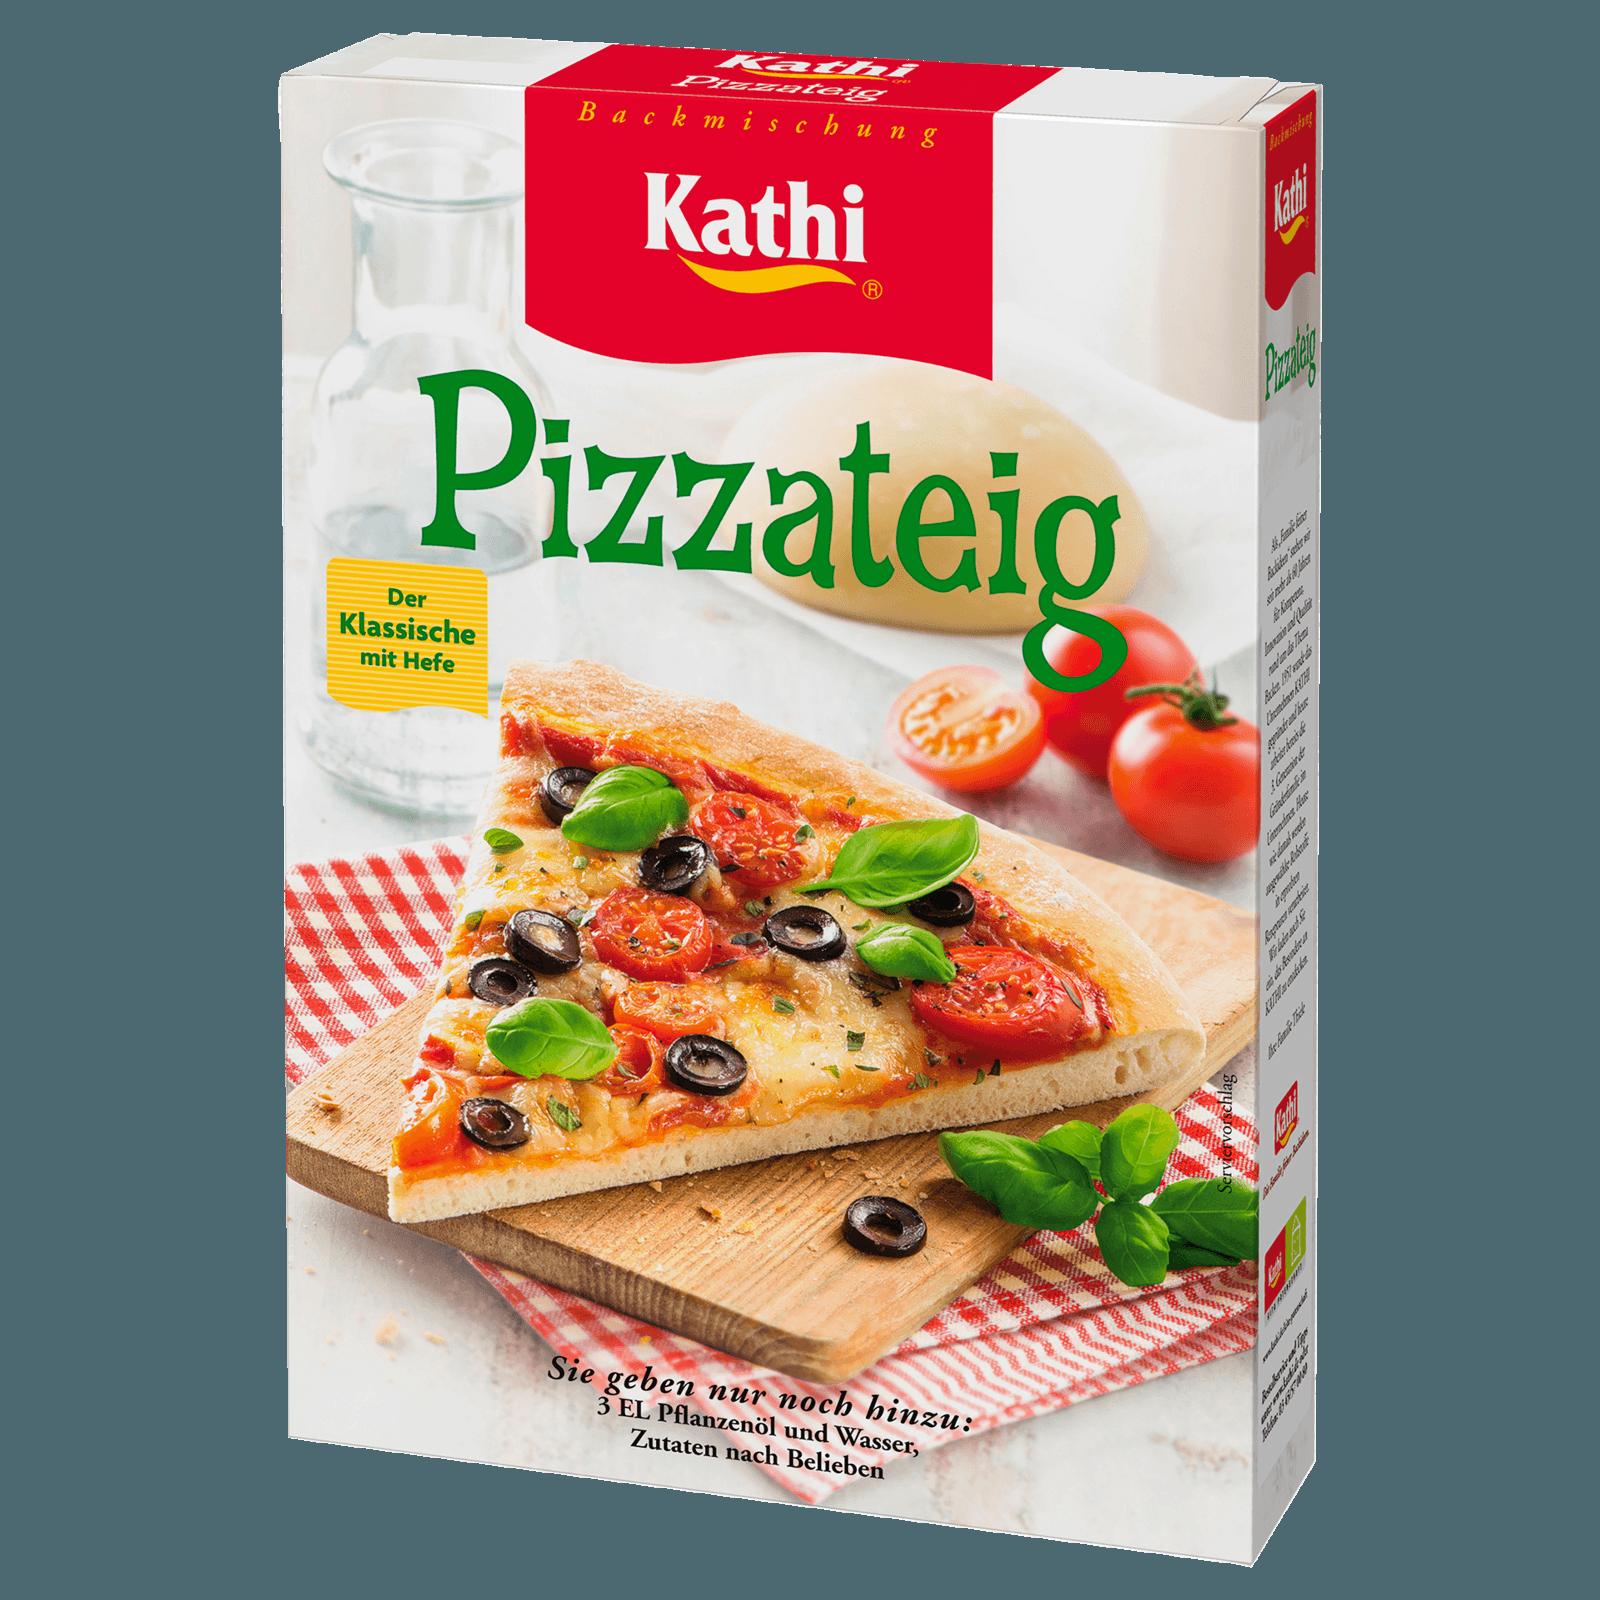 Klassischer pizzateig